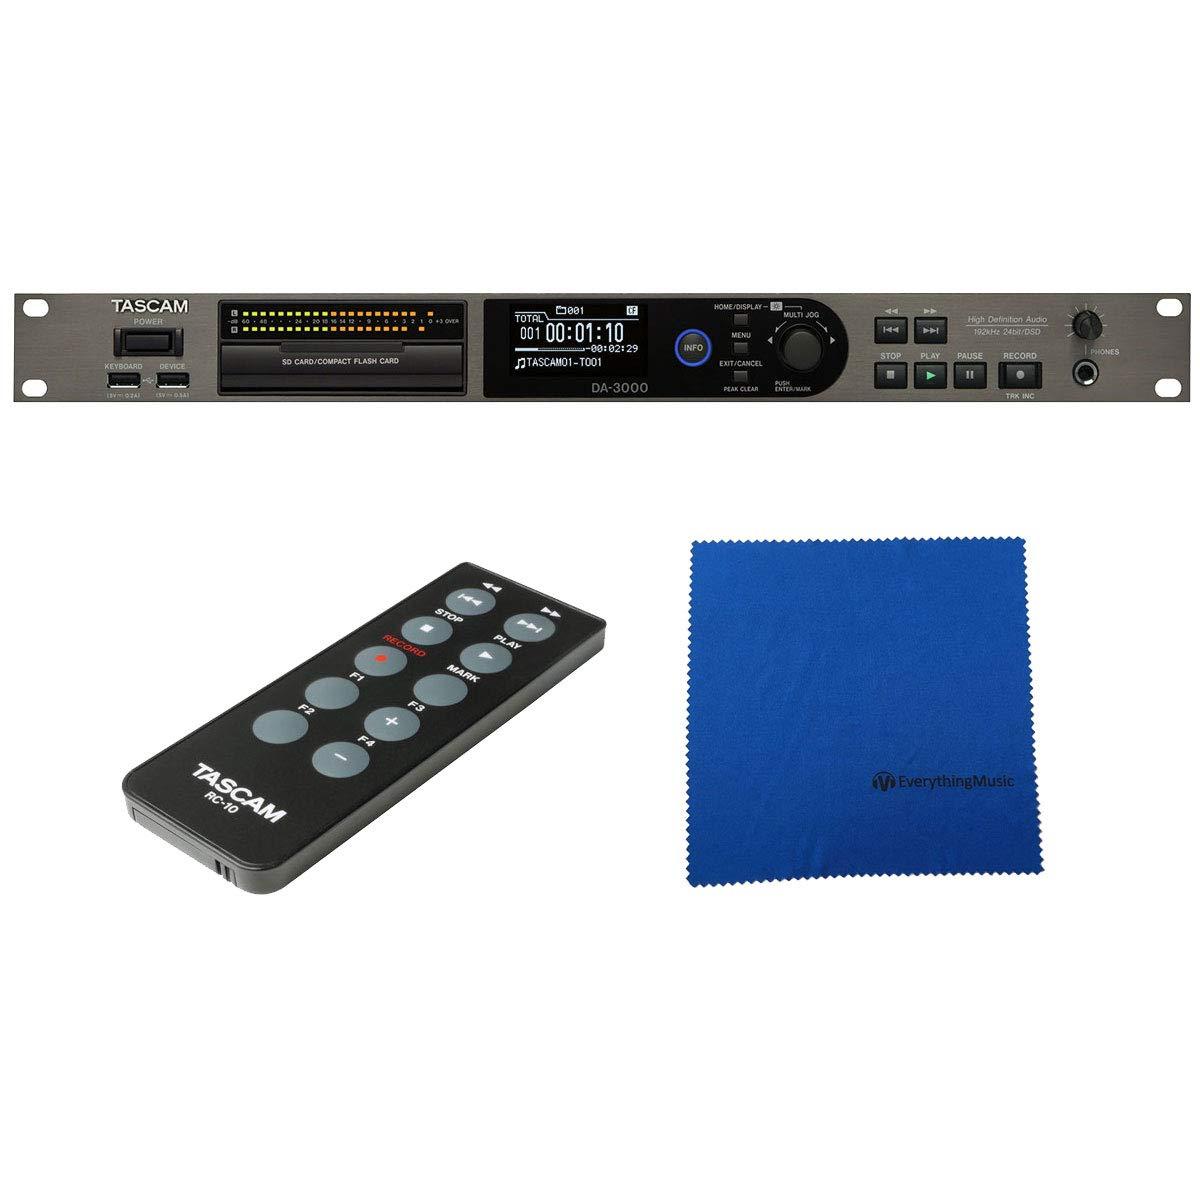 Tasdcam DA-3000 High Resolution Stereo Master Recorder and AD/DA Converter with Microfiber